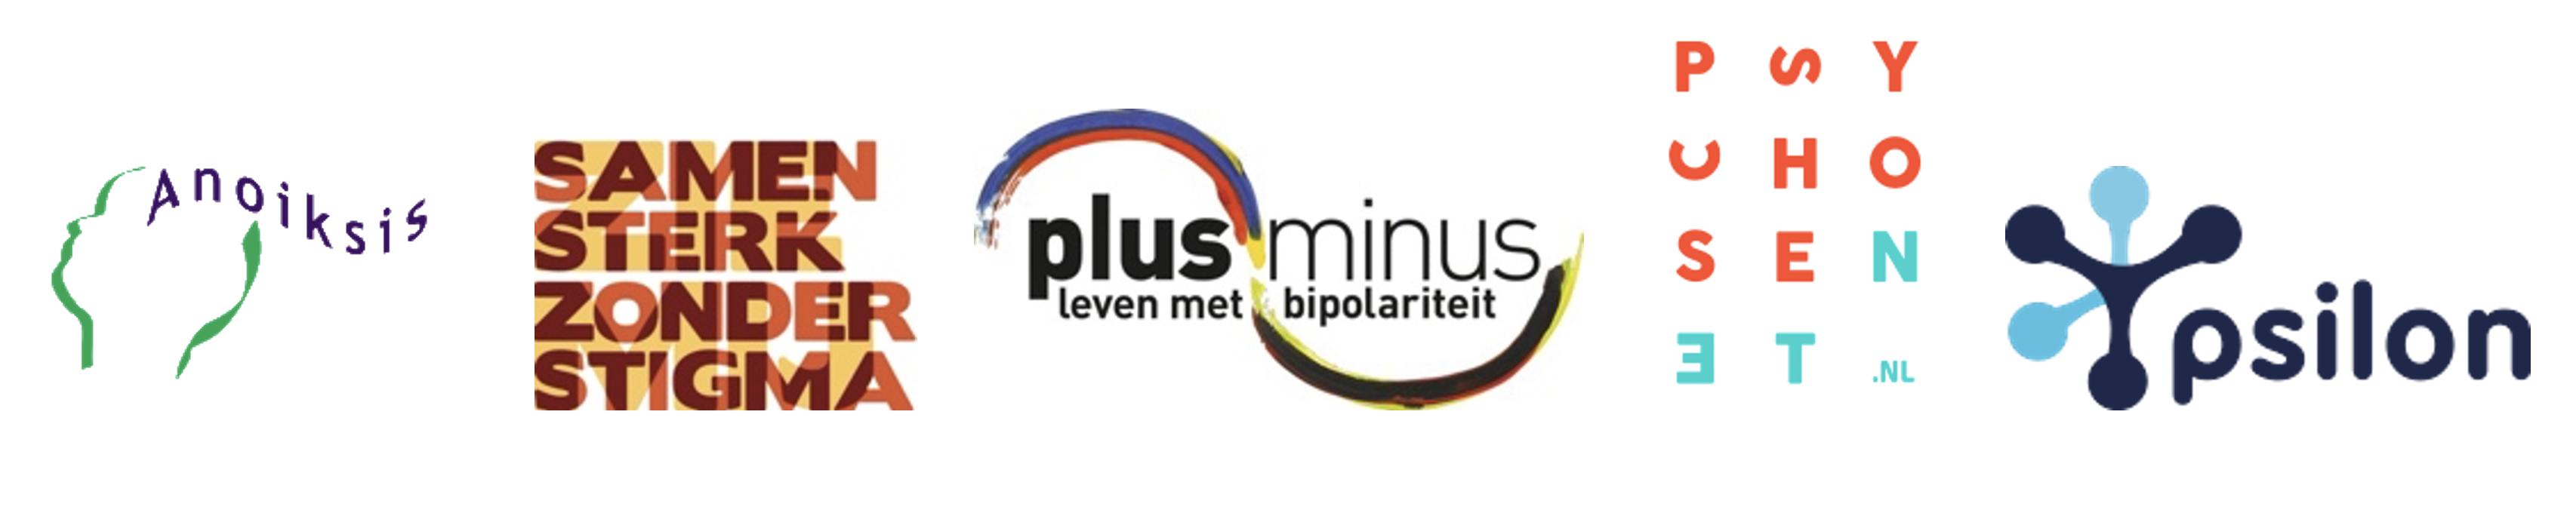 Anoiksis, Samen Sterk zonder Stigma, PlusMinus, Ps